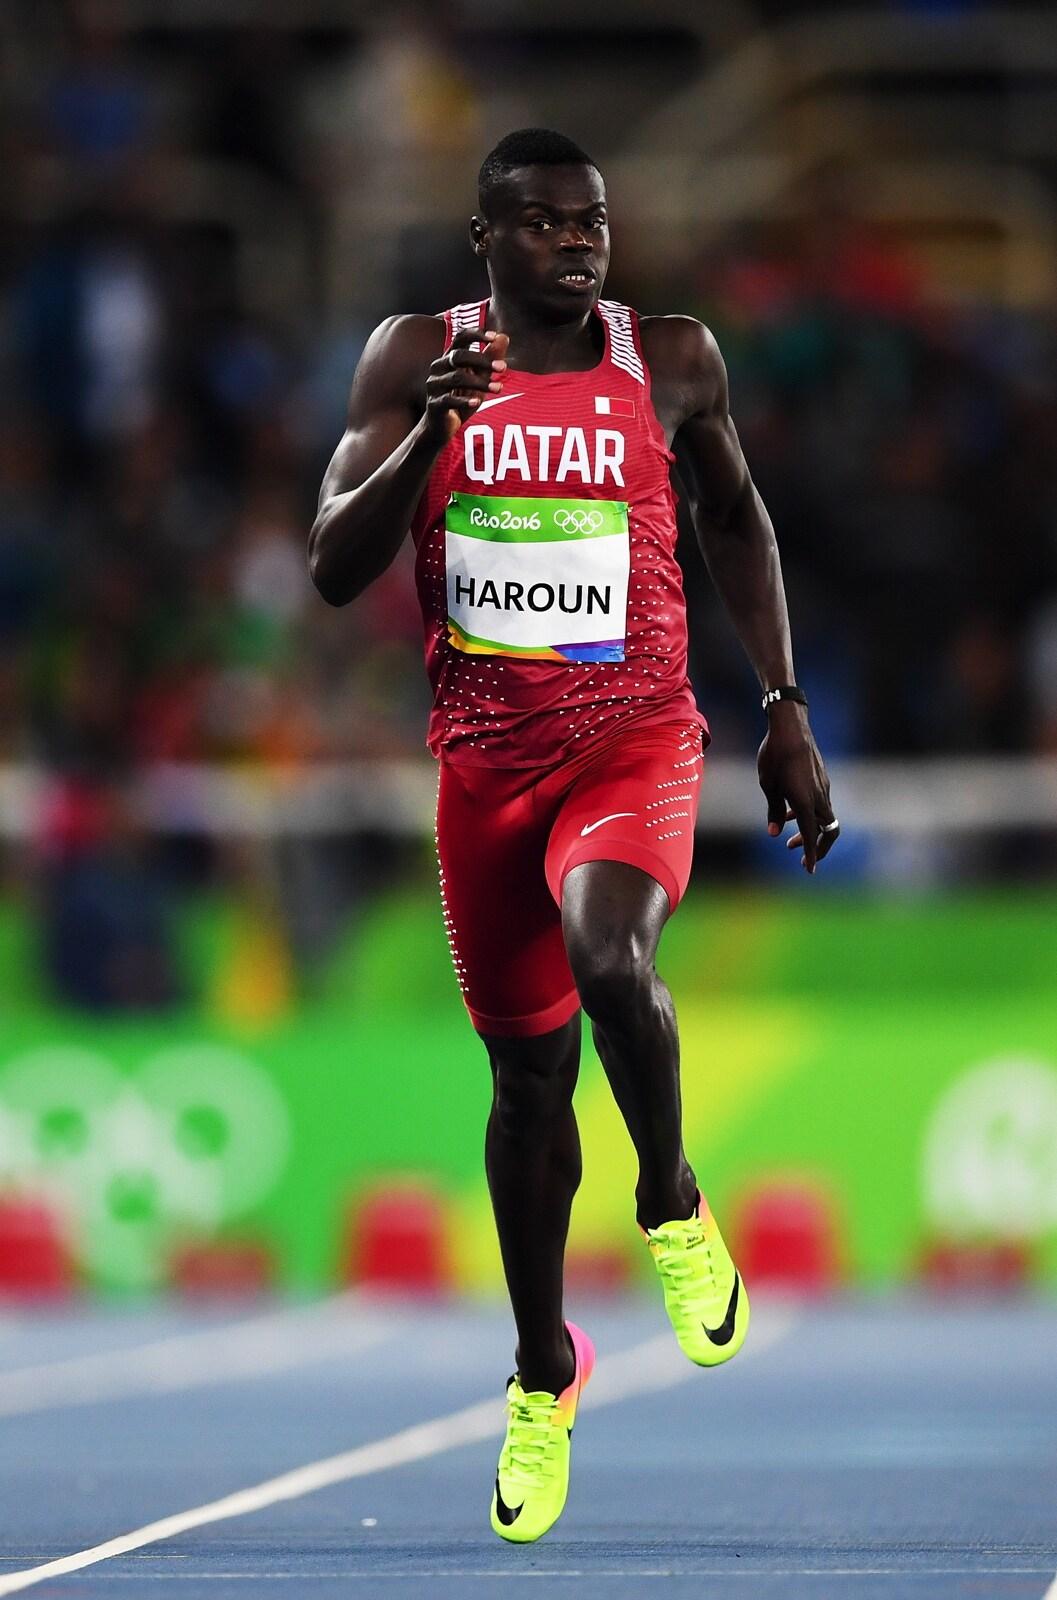 Athlétisme - 400m hommes